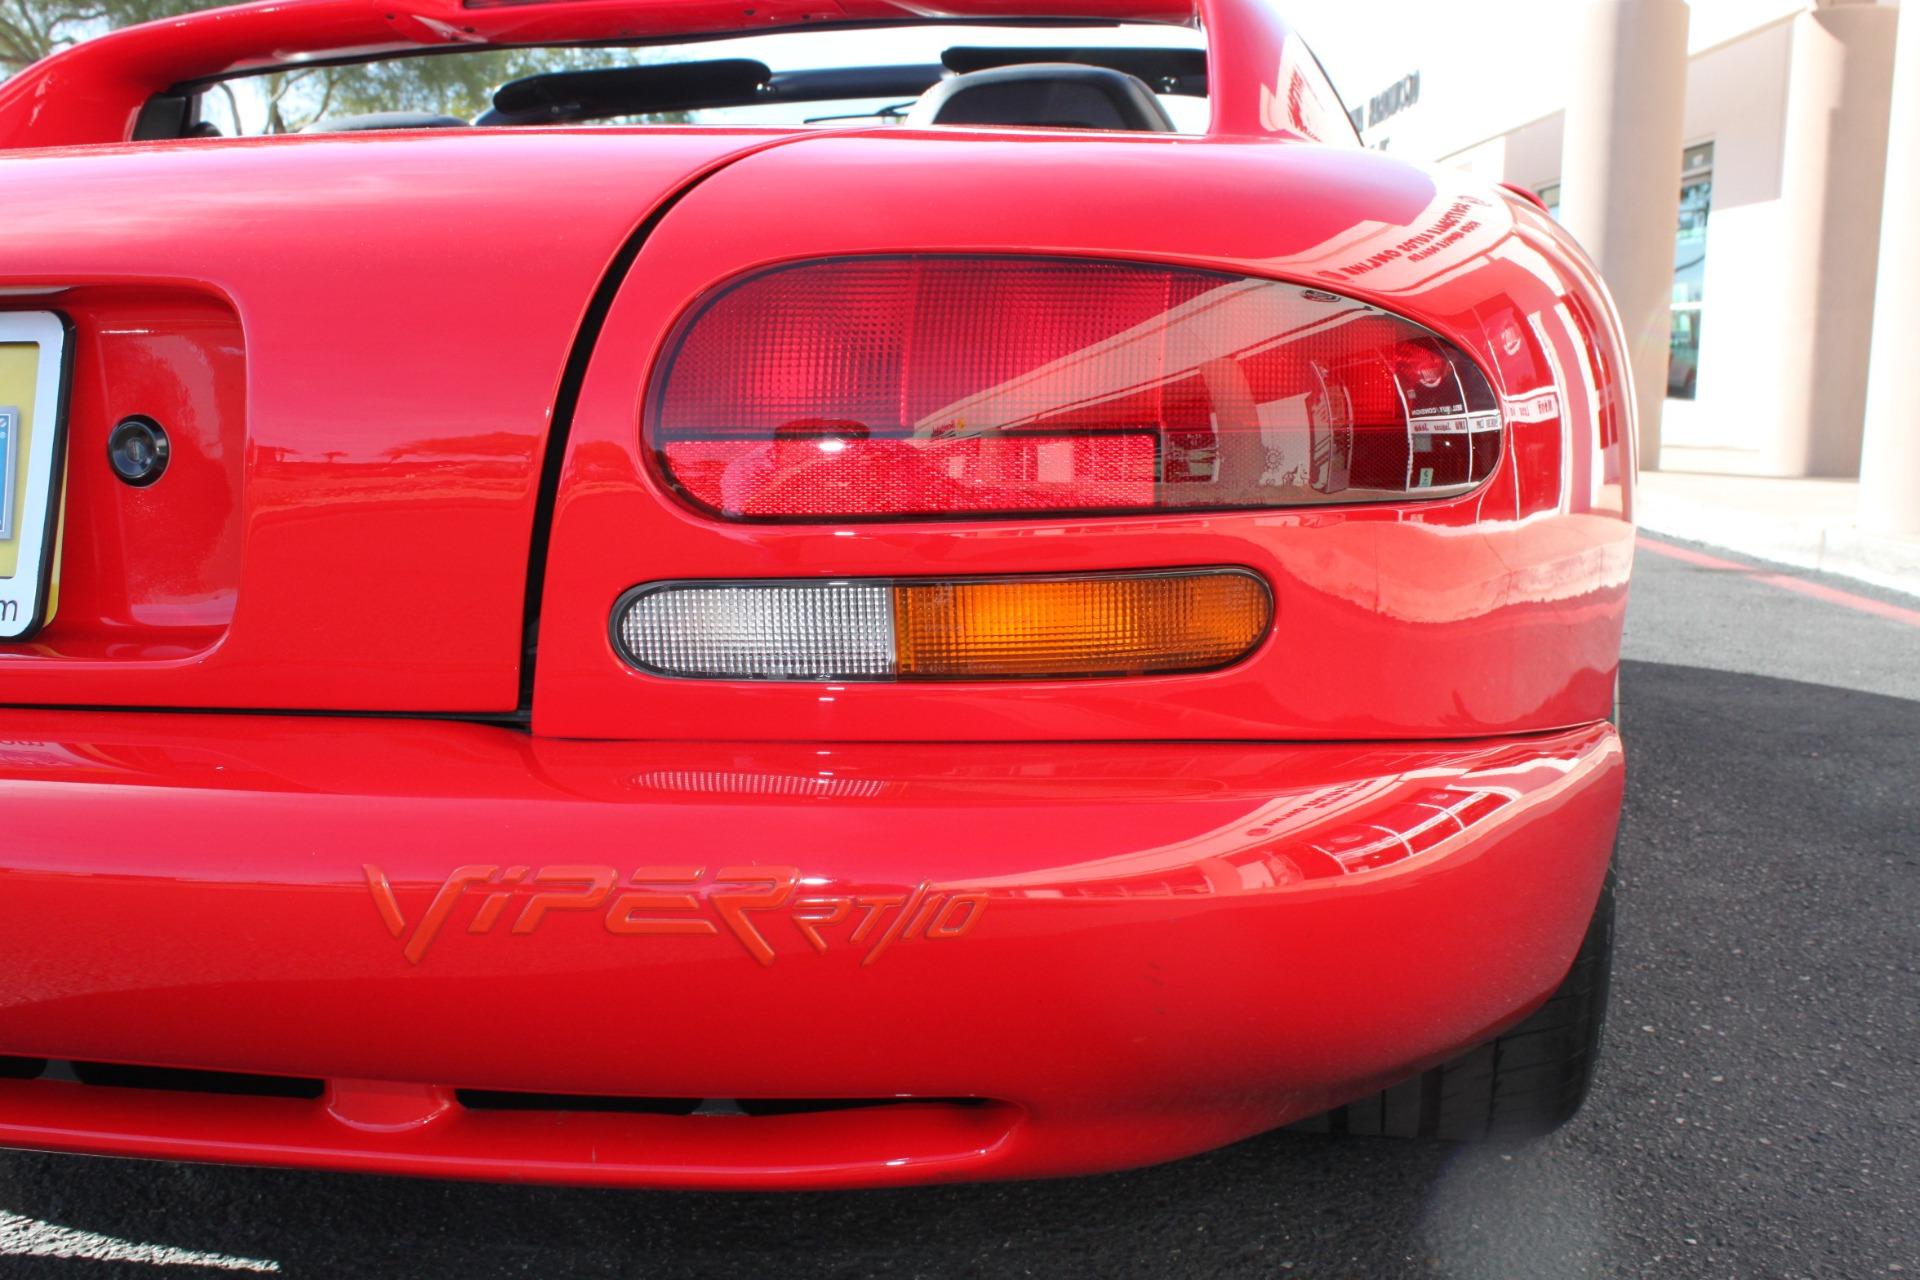 Used-1993-Dodge-Viper-Sports-Car-Dodge